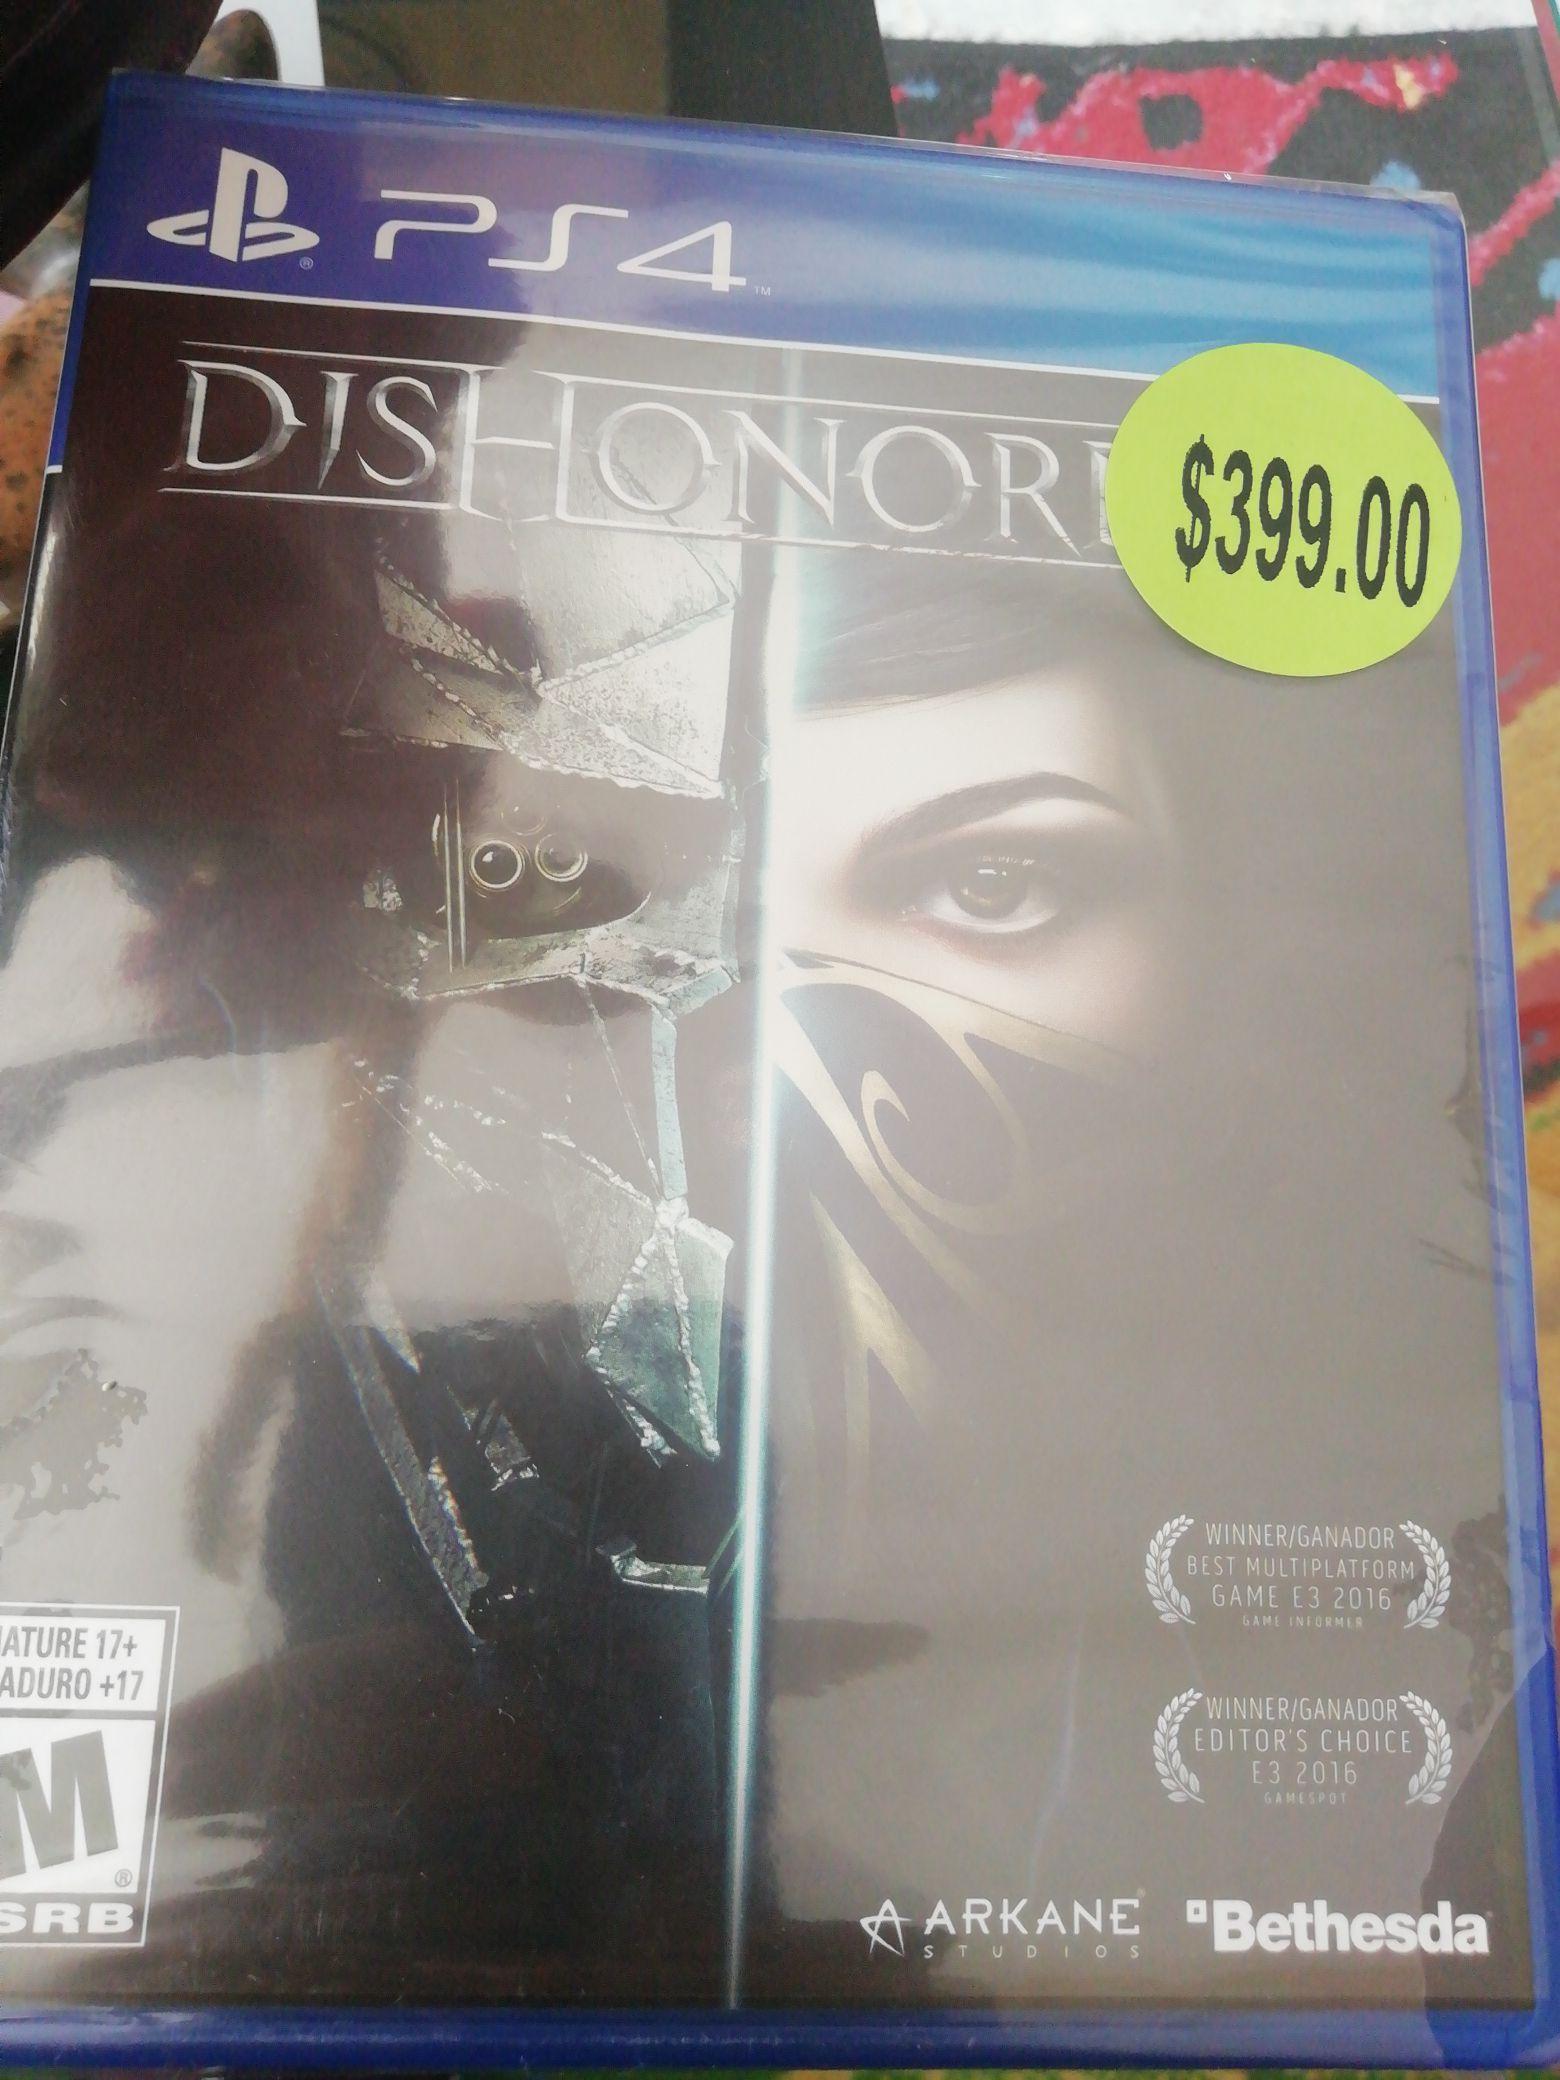 Bodega Aurrerá: DISHONOR PS4